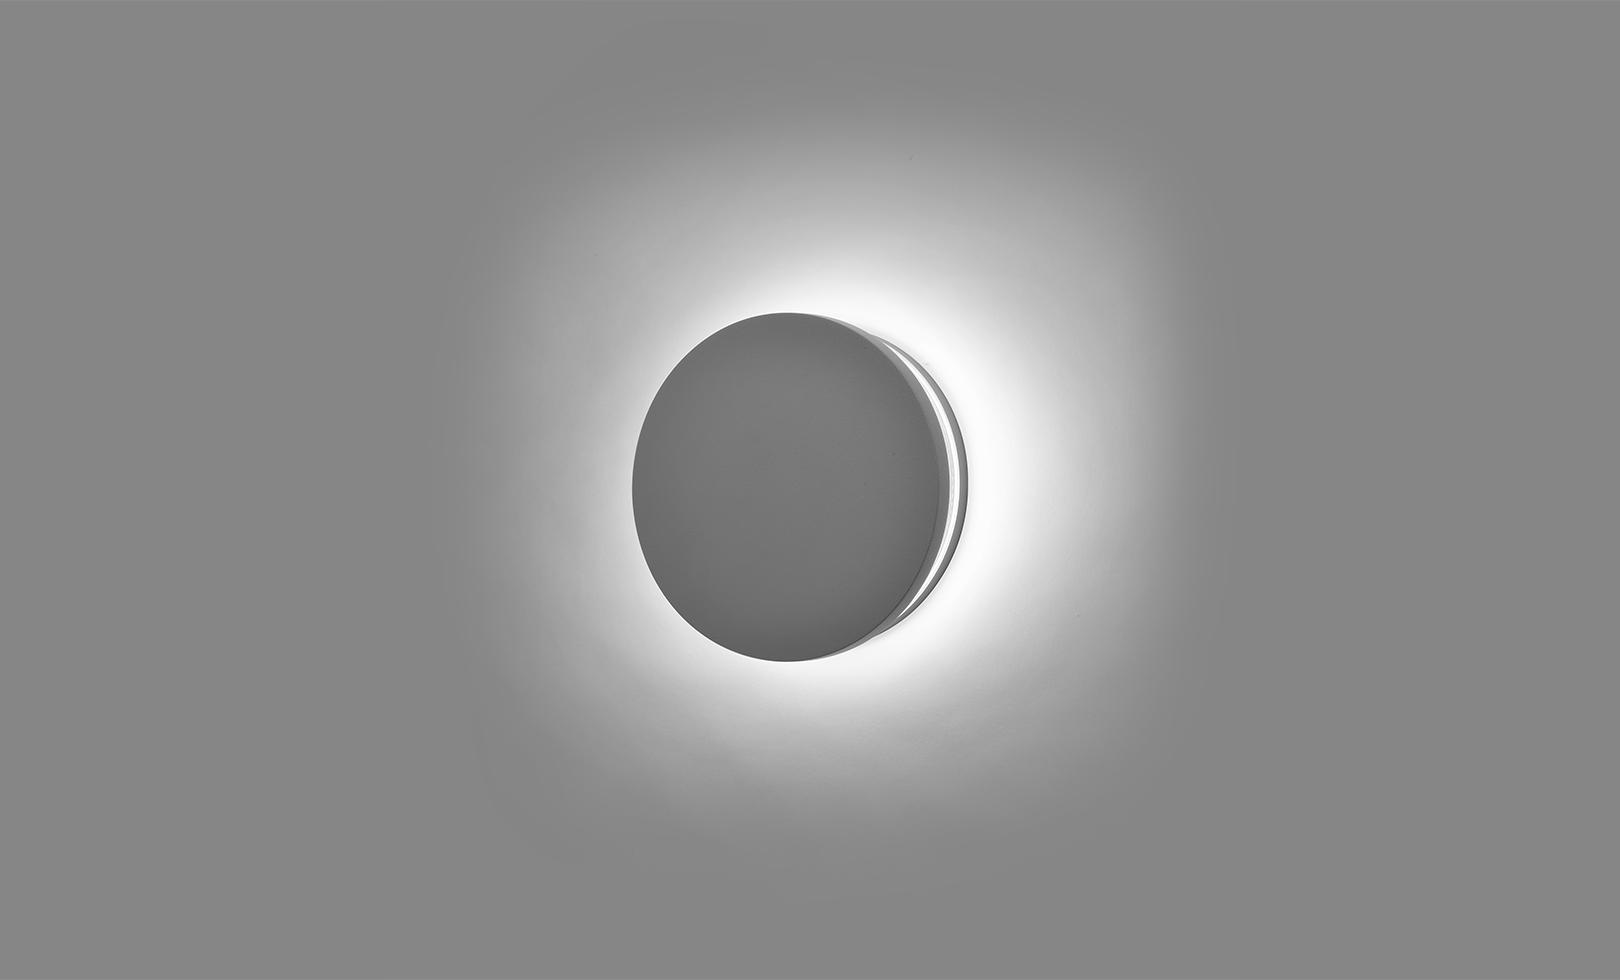 401705 ECLIPSE MEDIUM ROUND LED 12W 1